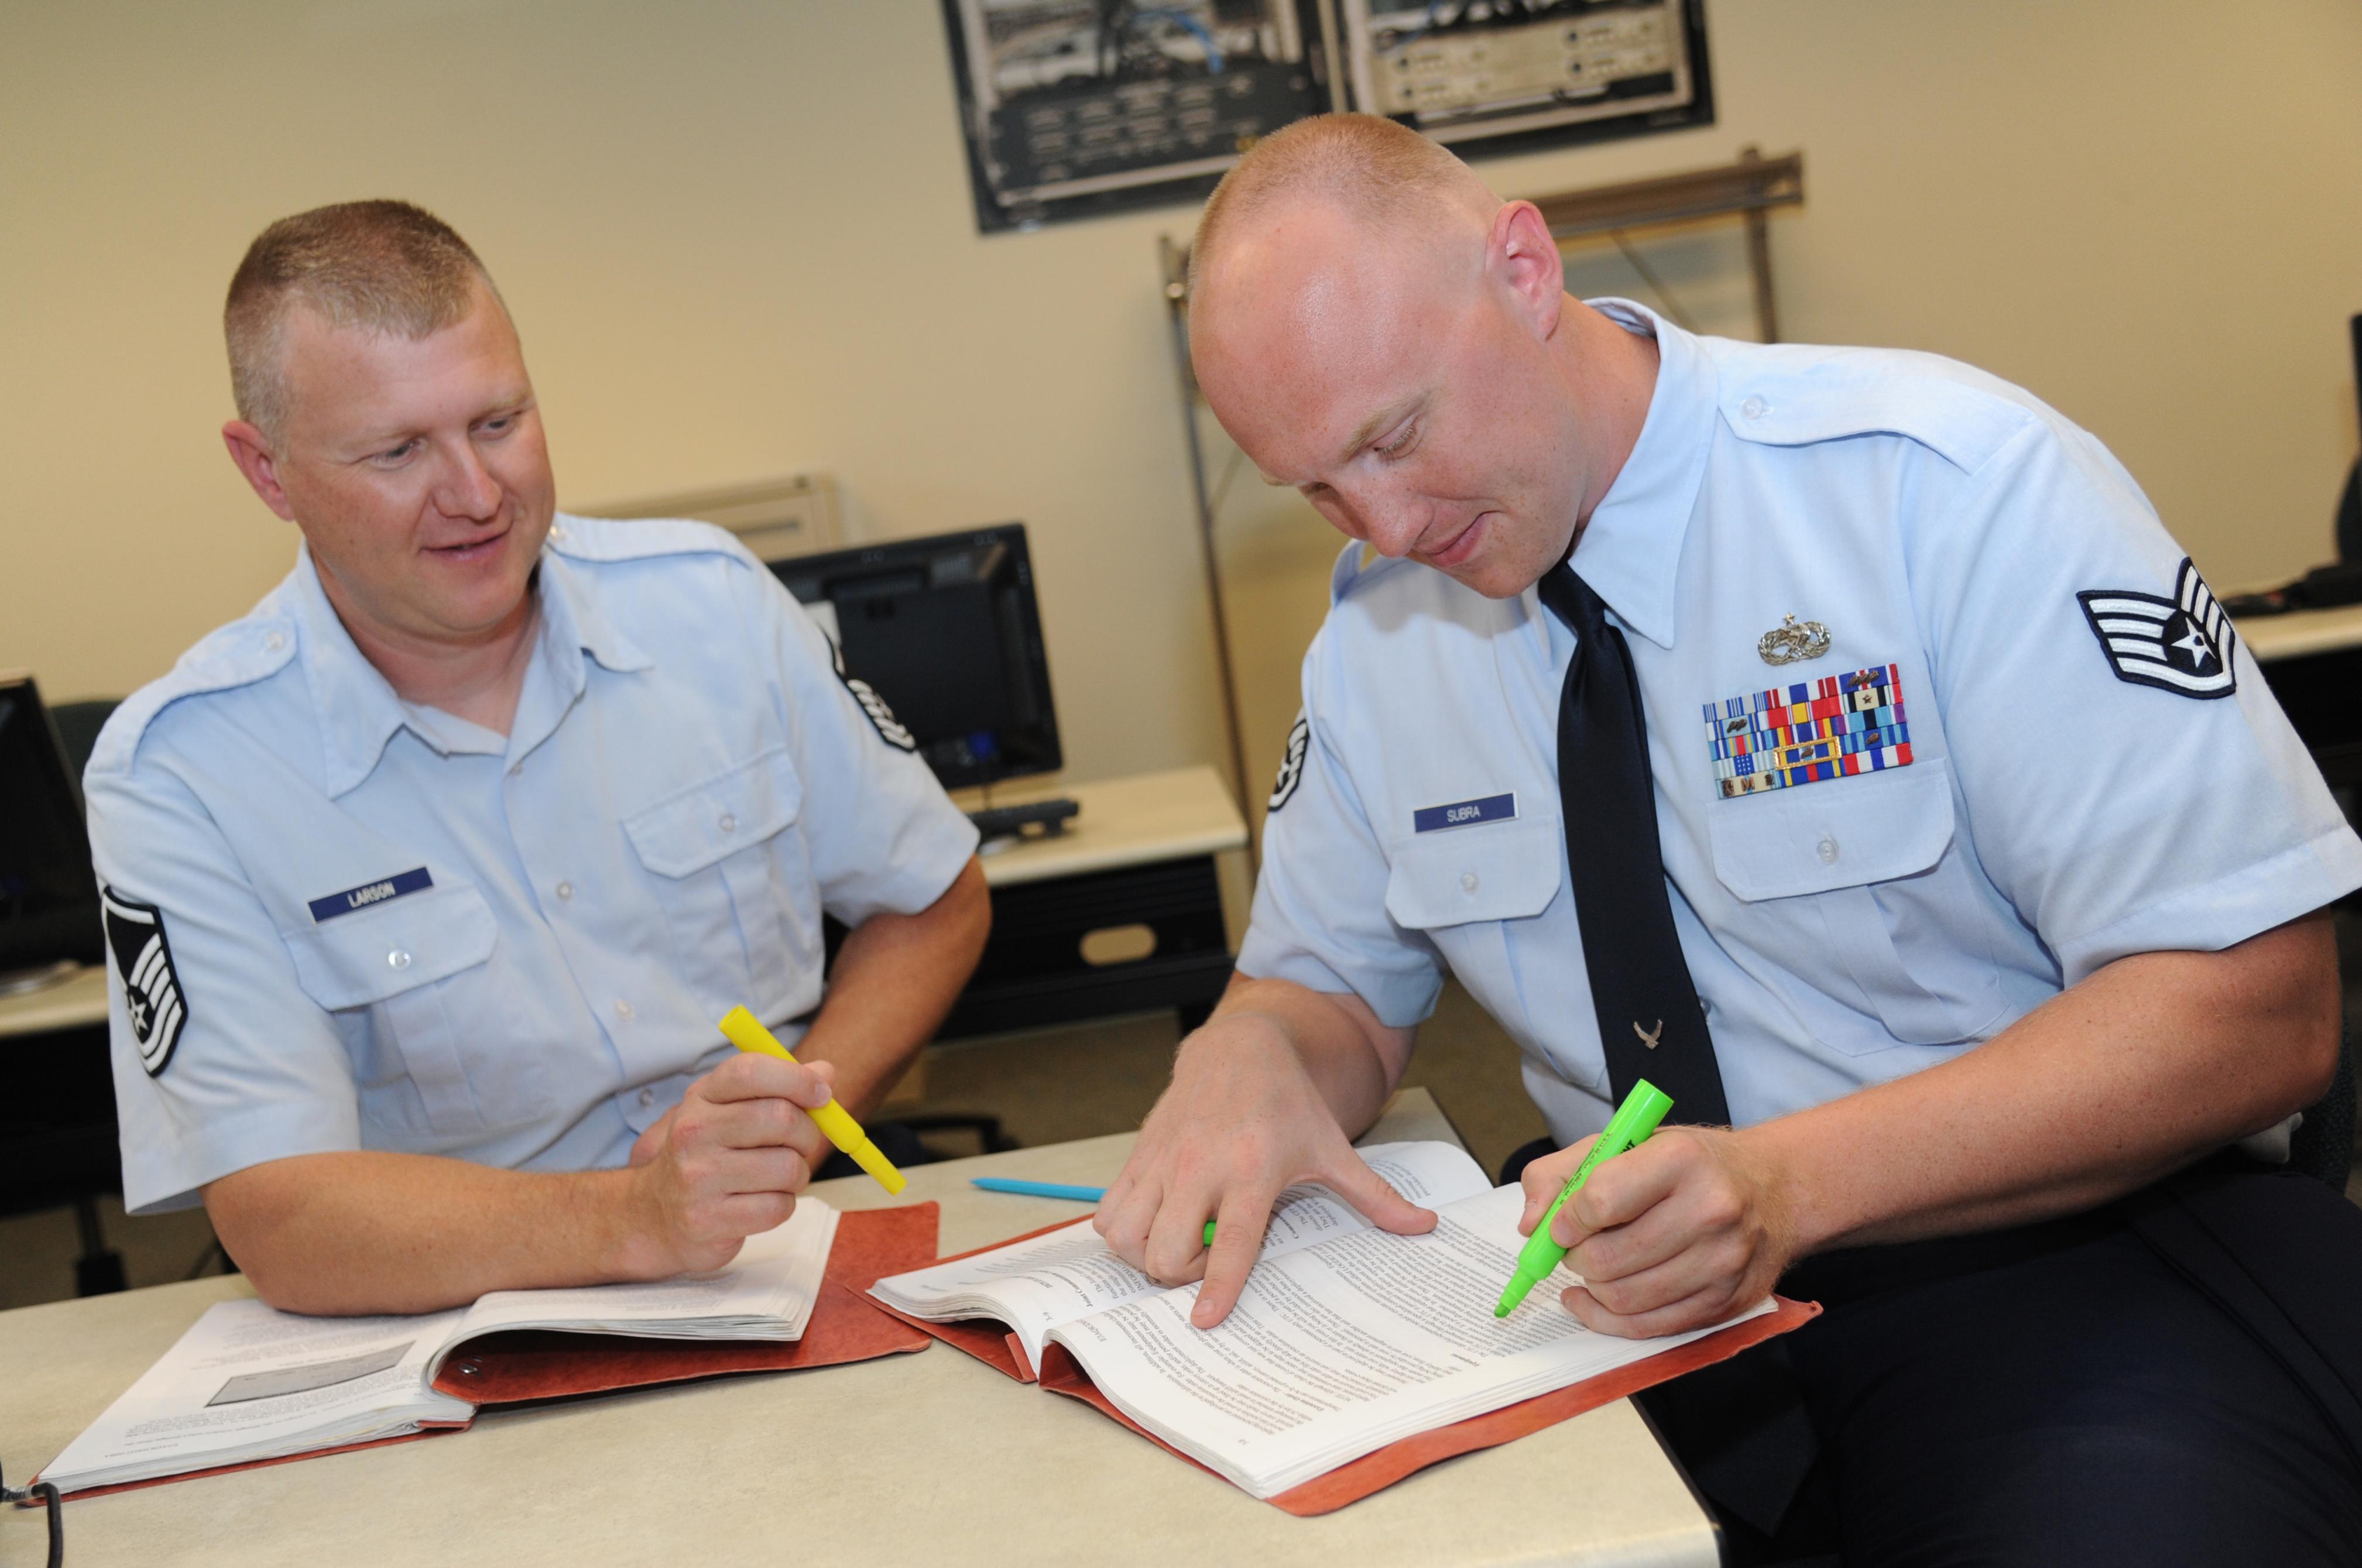 Airmen earn perfect scores